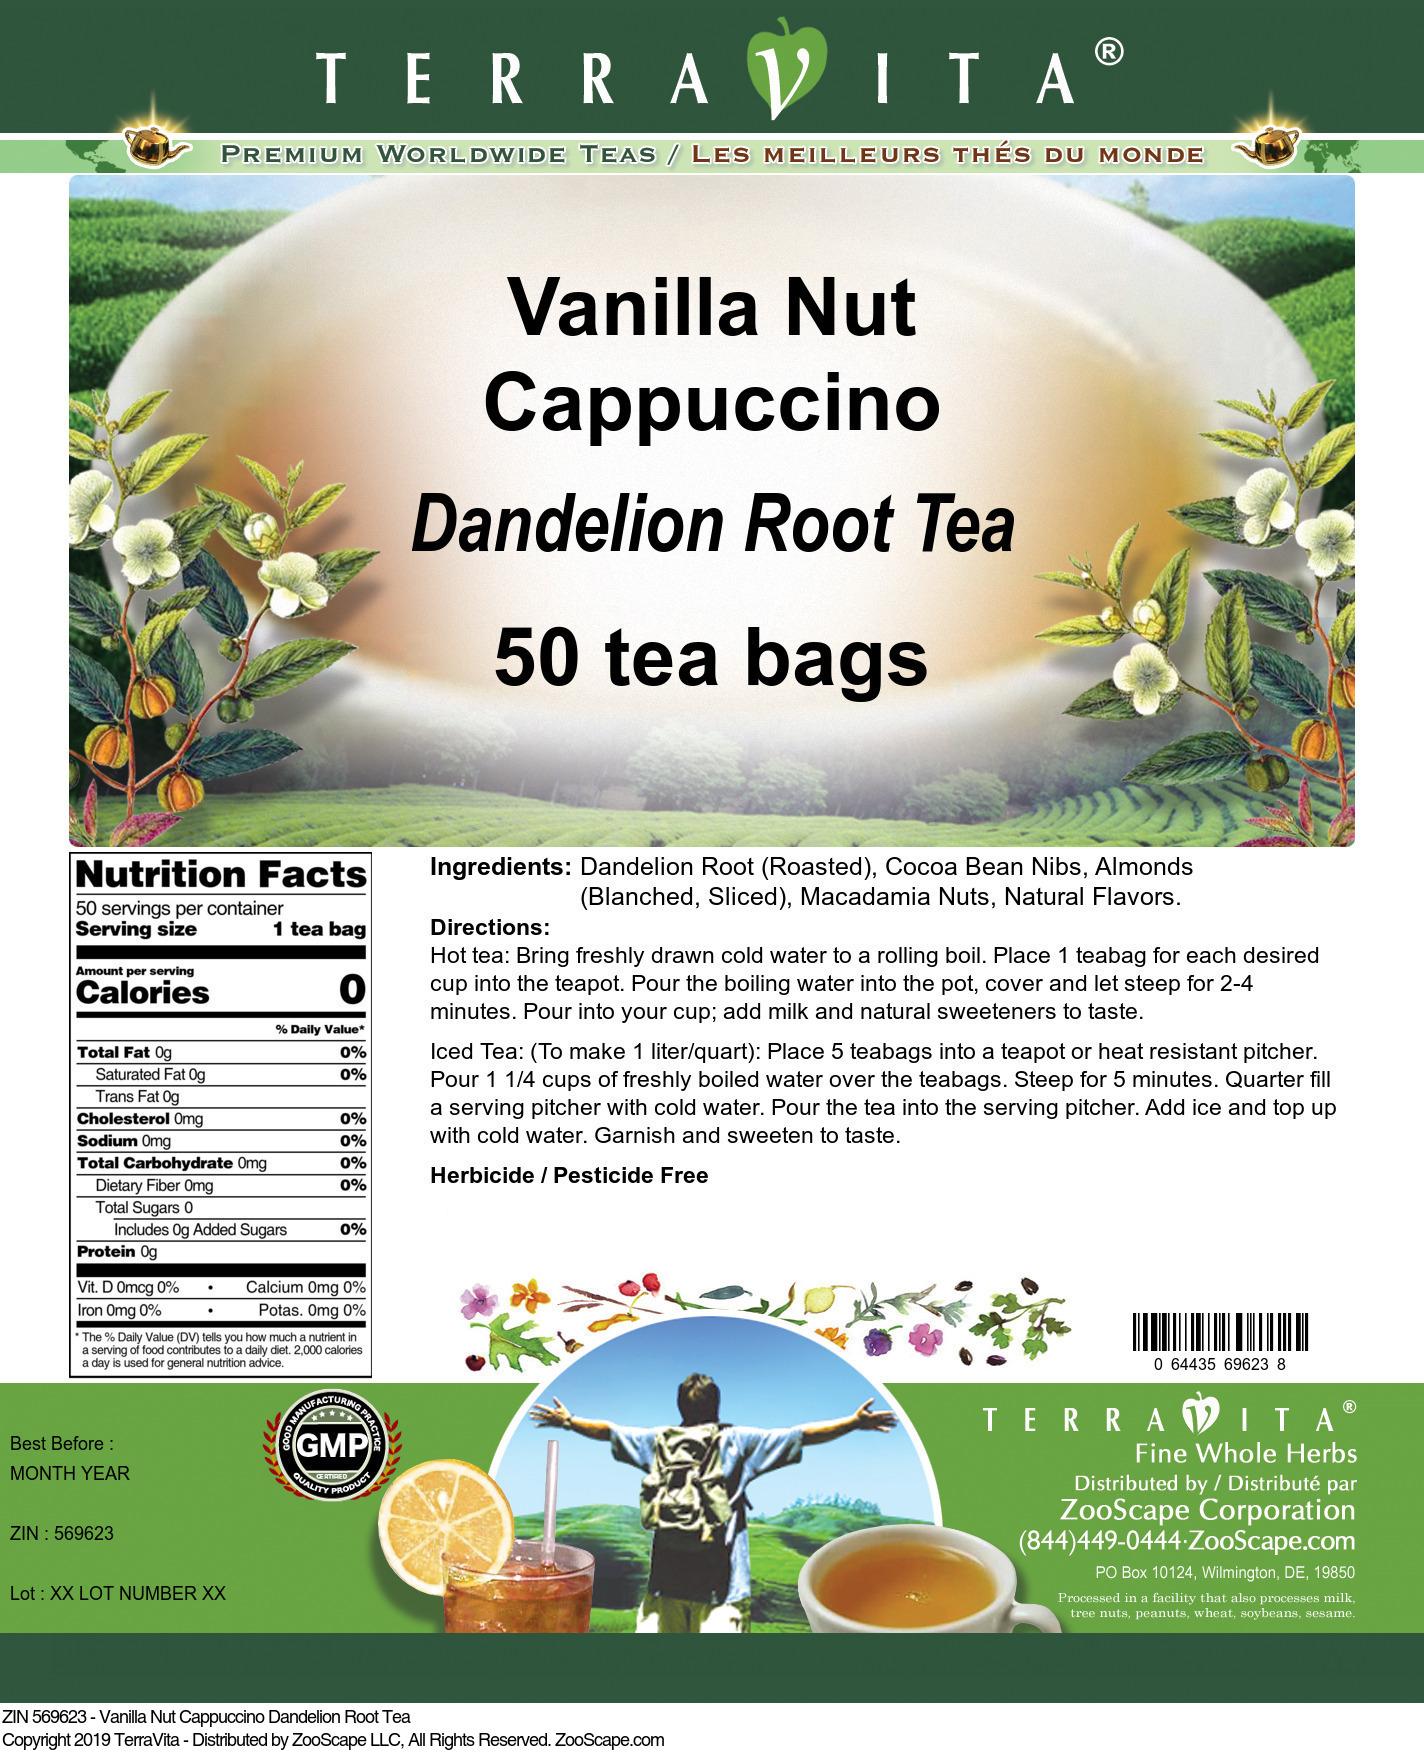 Vanilla Nut Cappuccino Dandelion Root